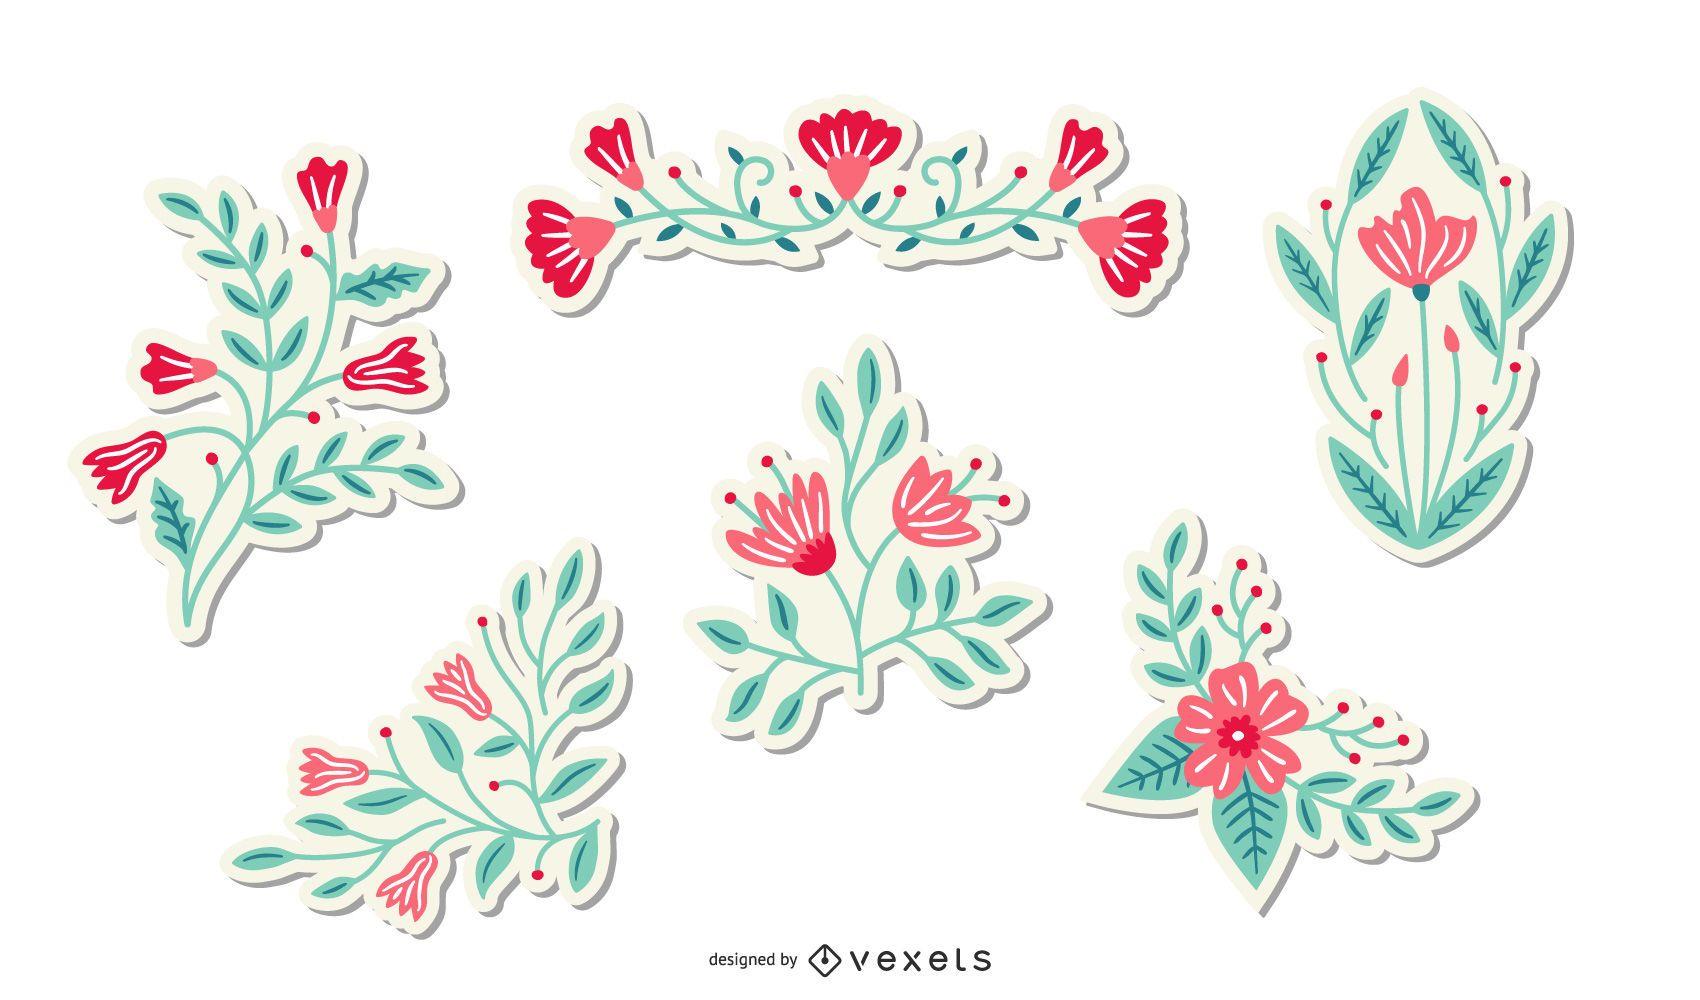 Paquete de pegatinas de flores de primavera